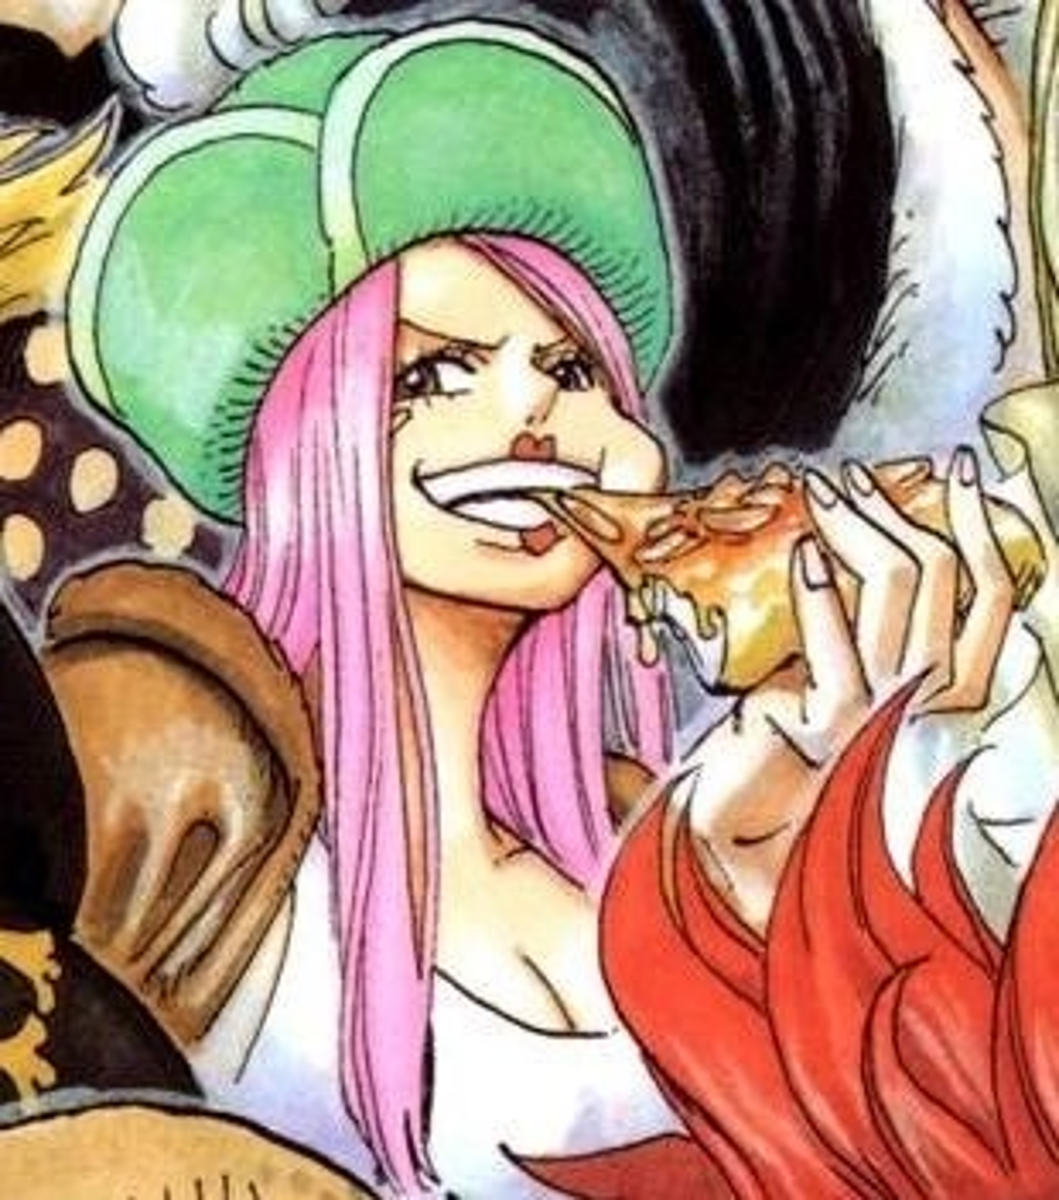 Image Jewelry Bonneys Manga Color Scheme Pre Timeskip